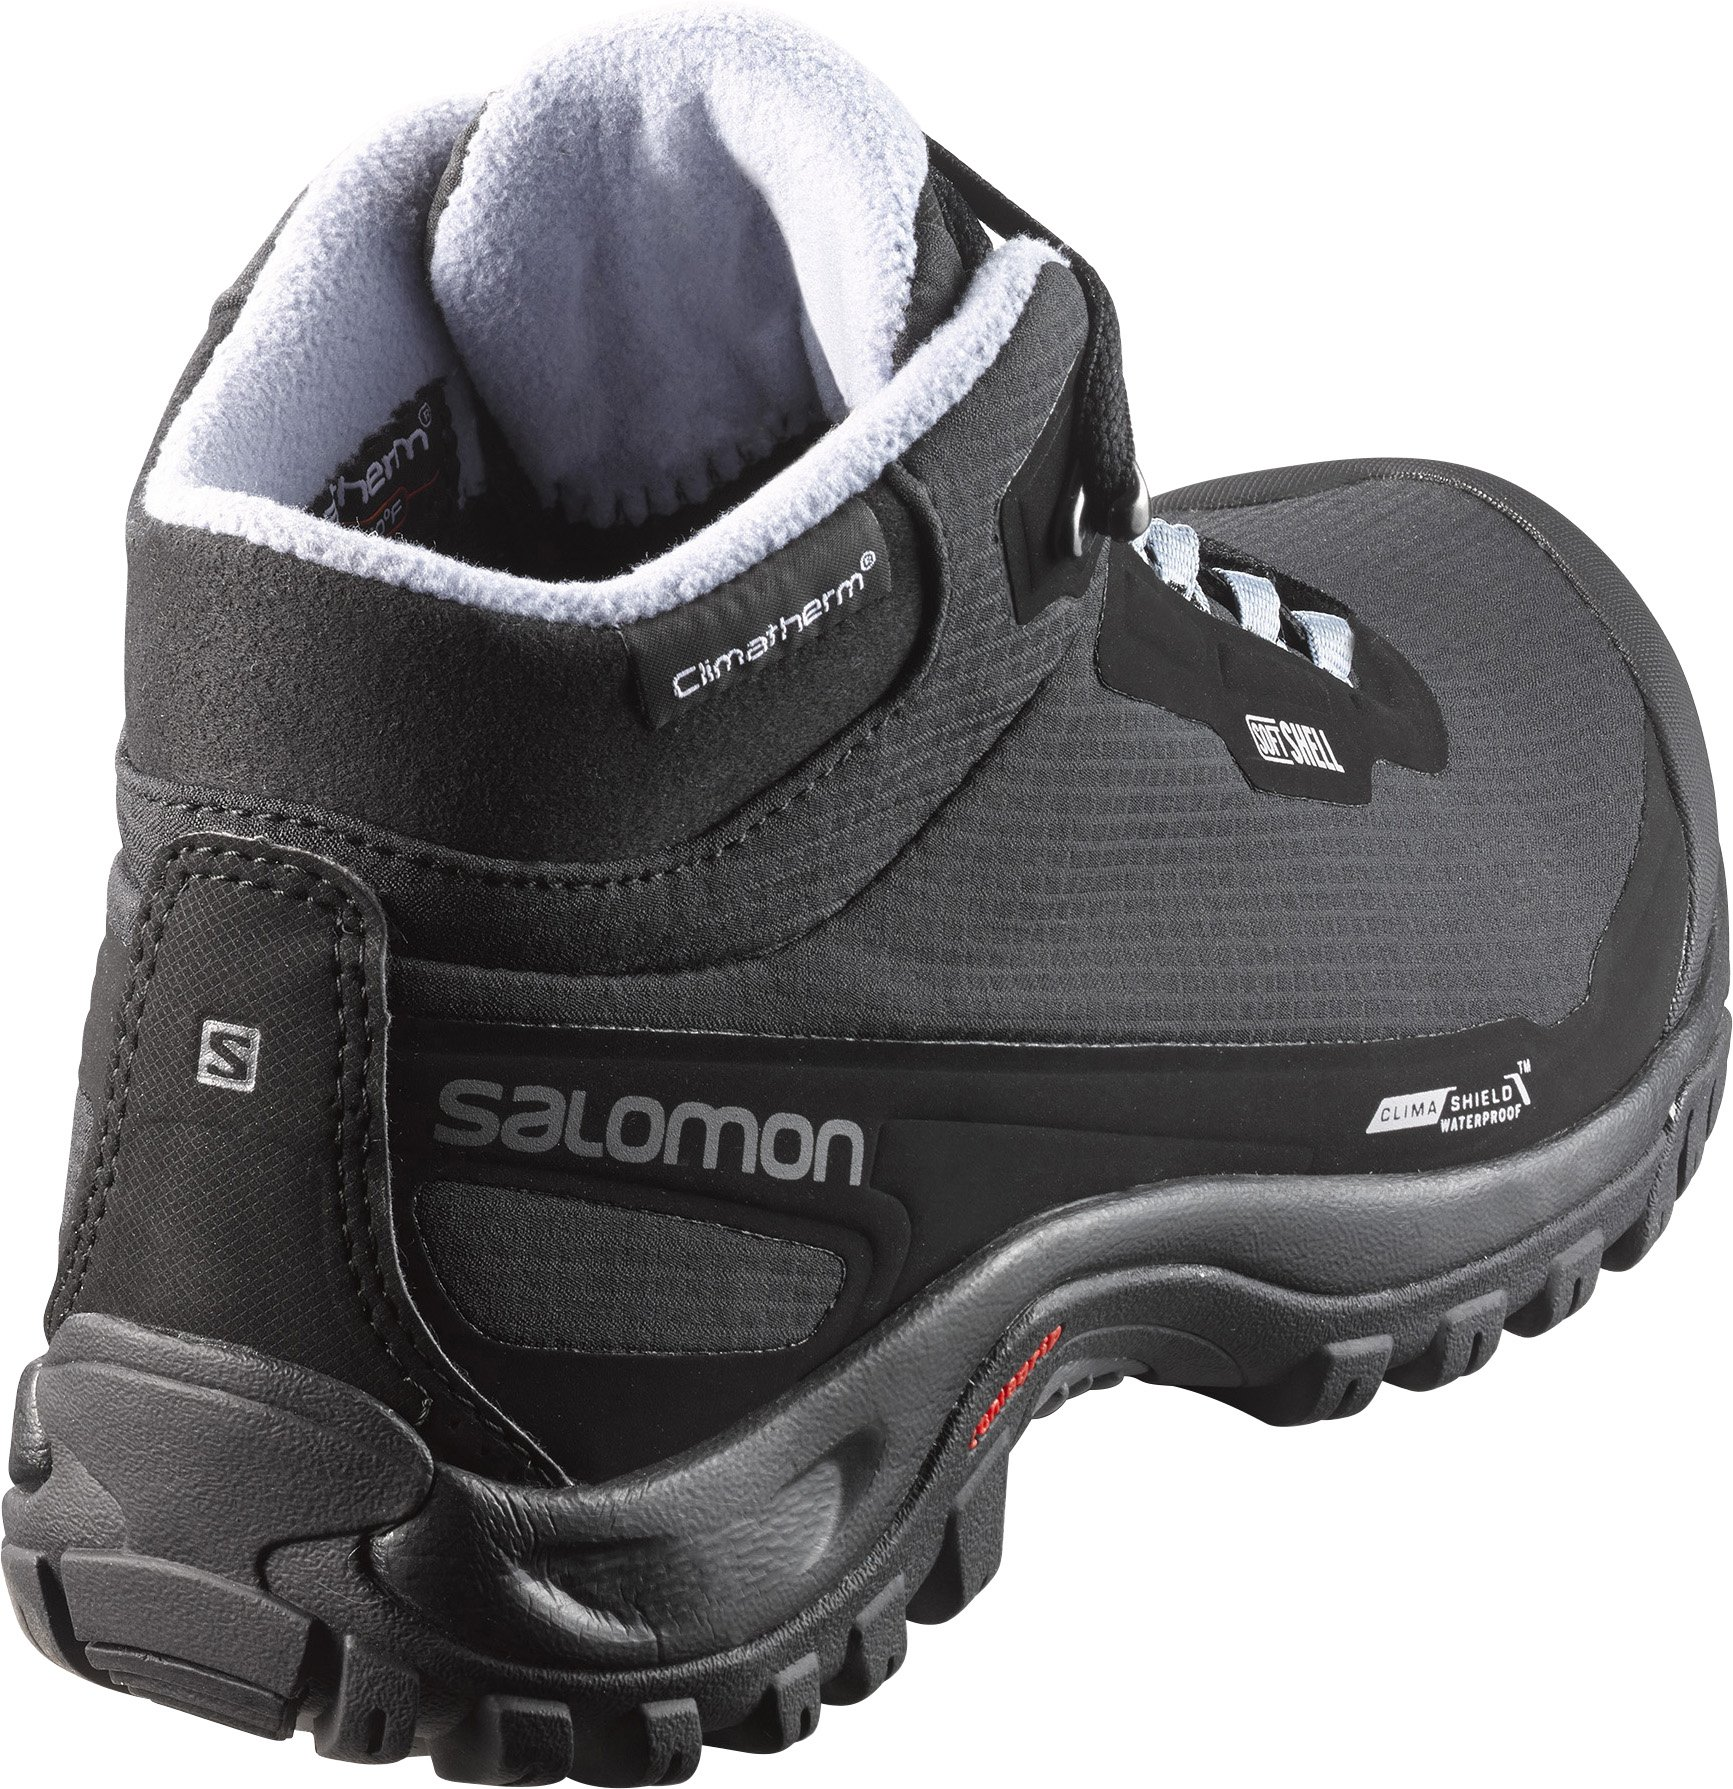 995e5fa4a6 https   www.sportby.sk snowboarding snowboardove-viazanie detske ...